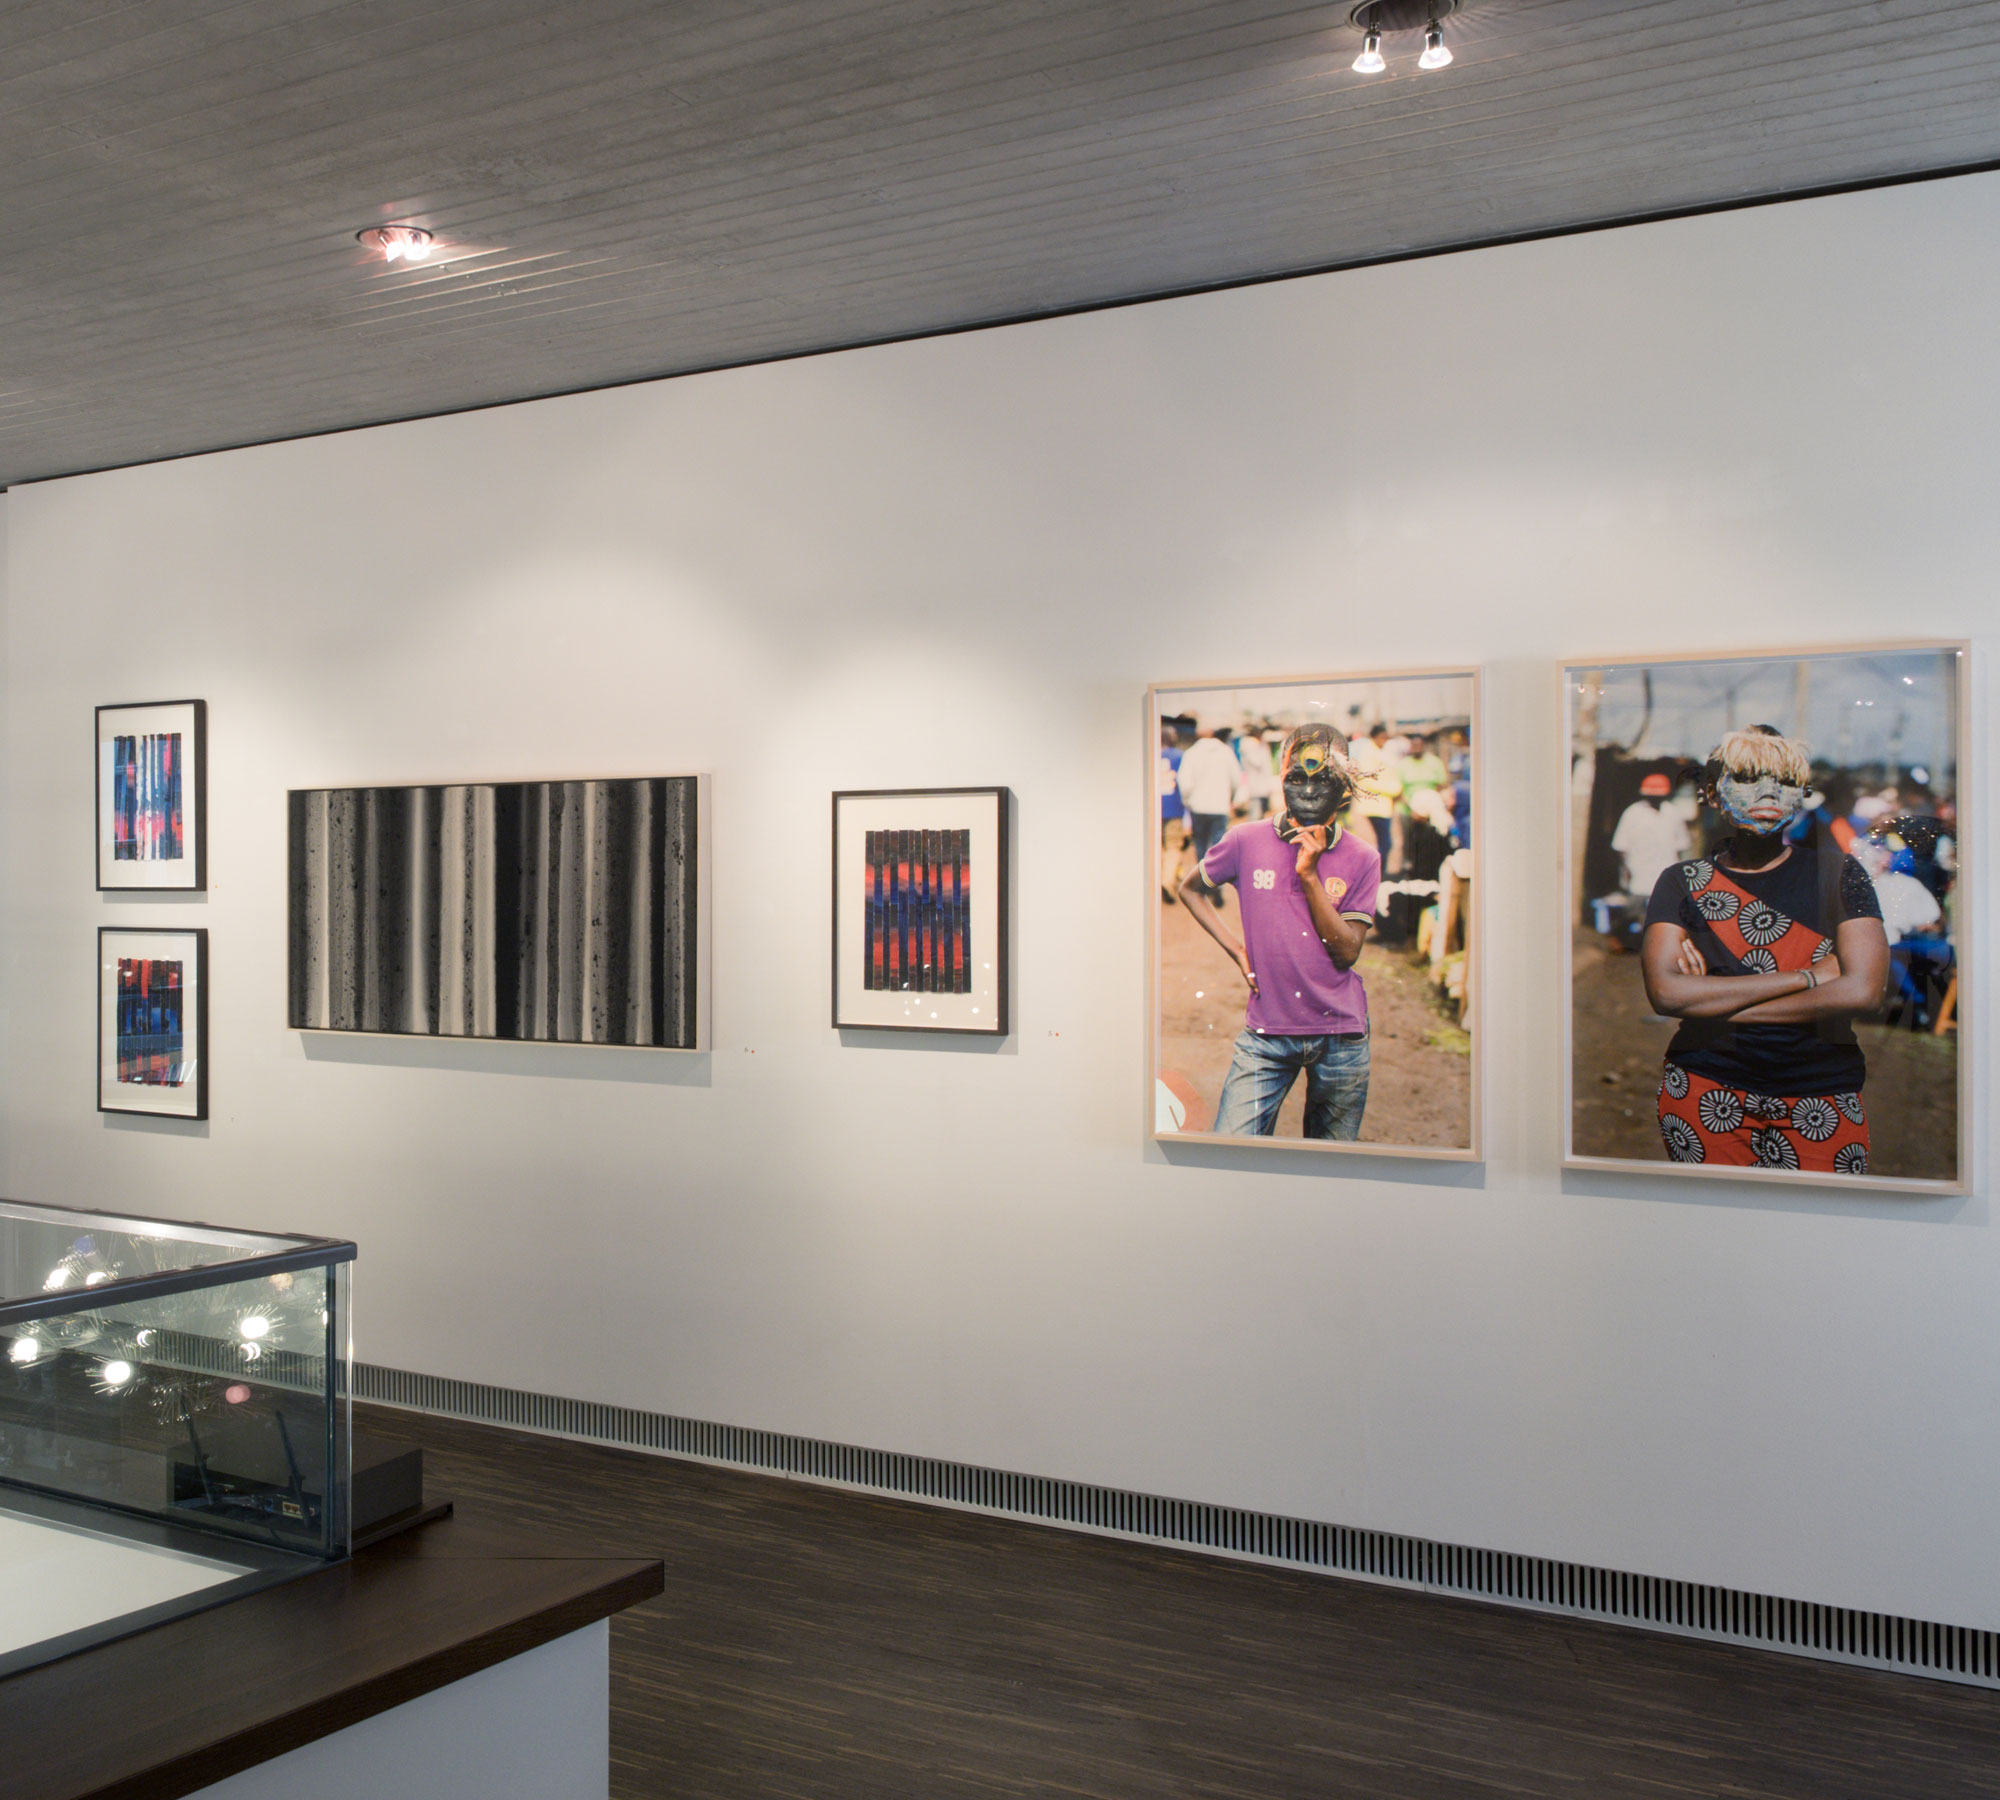 Ausstellung für Kinder und Familien in Berlin: Picha/Nairobi © me Collectors Room, Foto Lidia Terri | HIMBEER Magazin